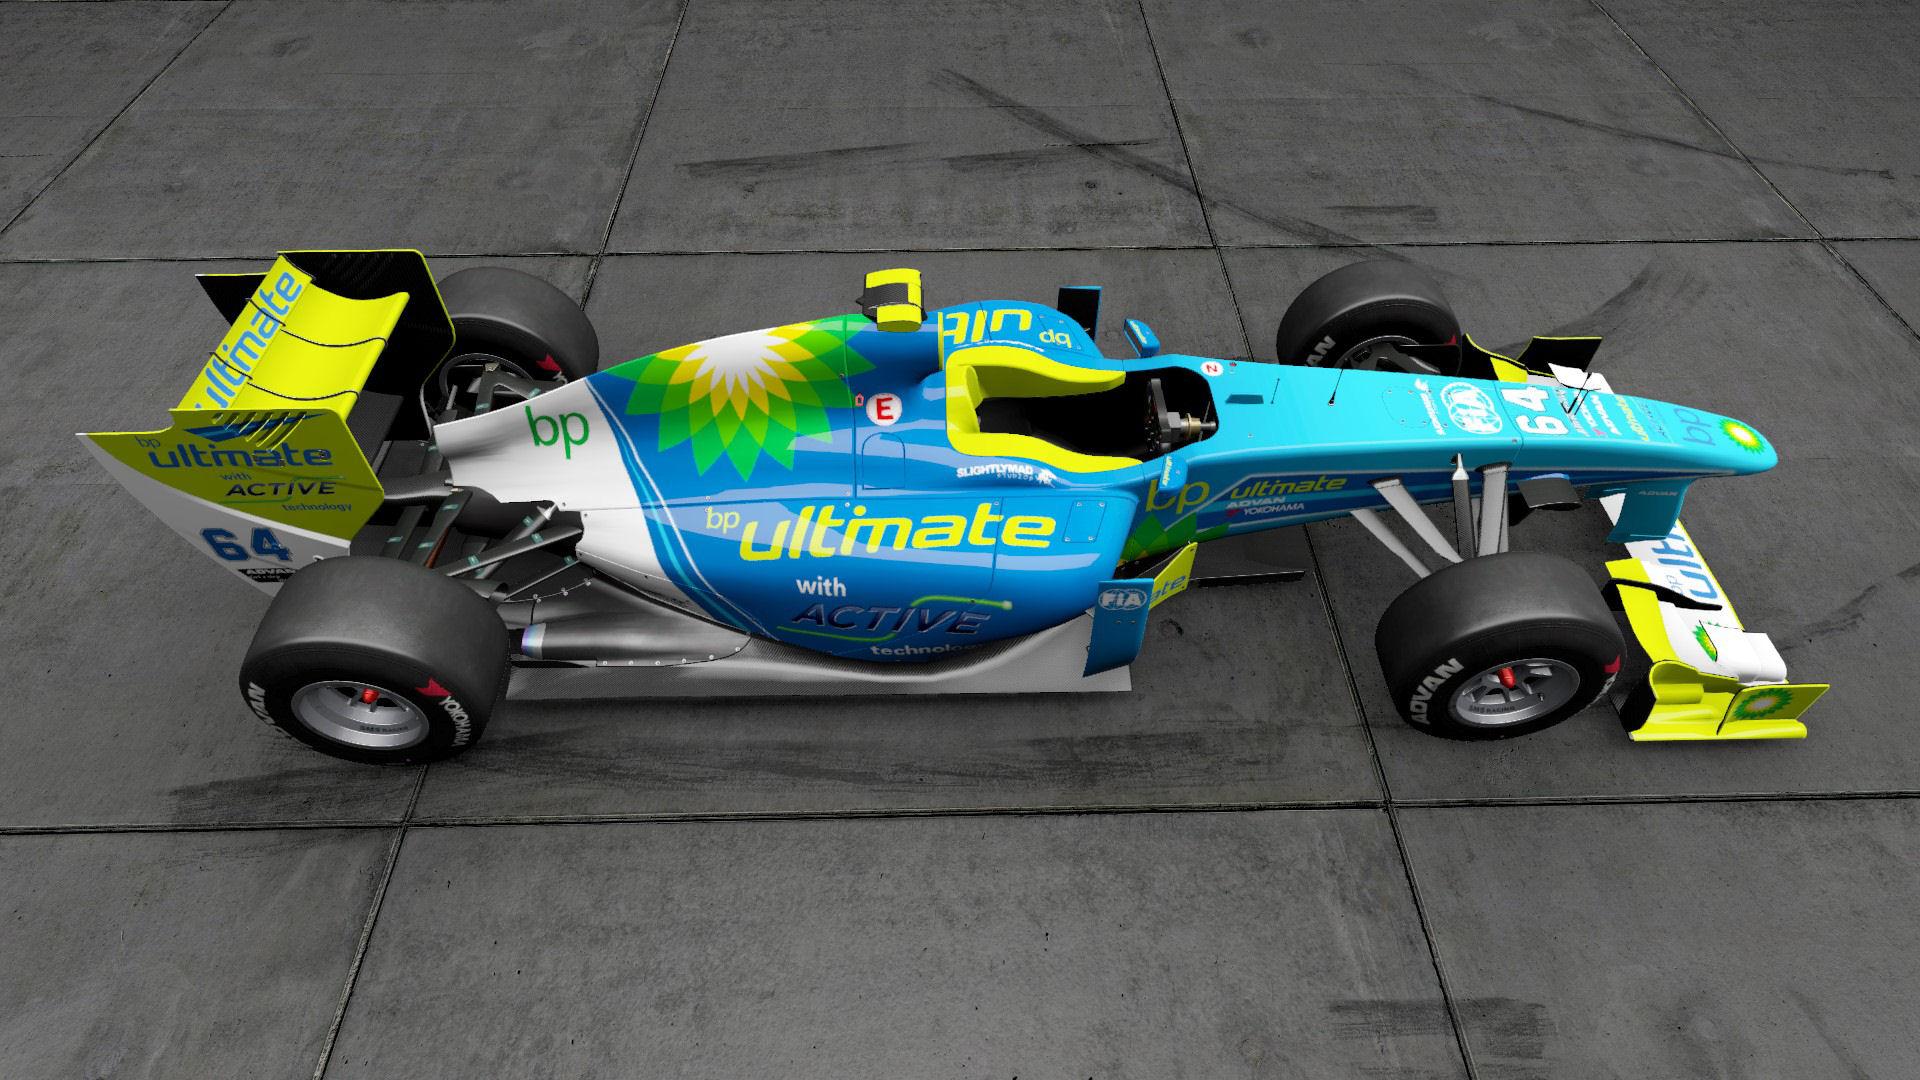 BP Ultimate Formula A 02.jpg